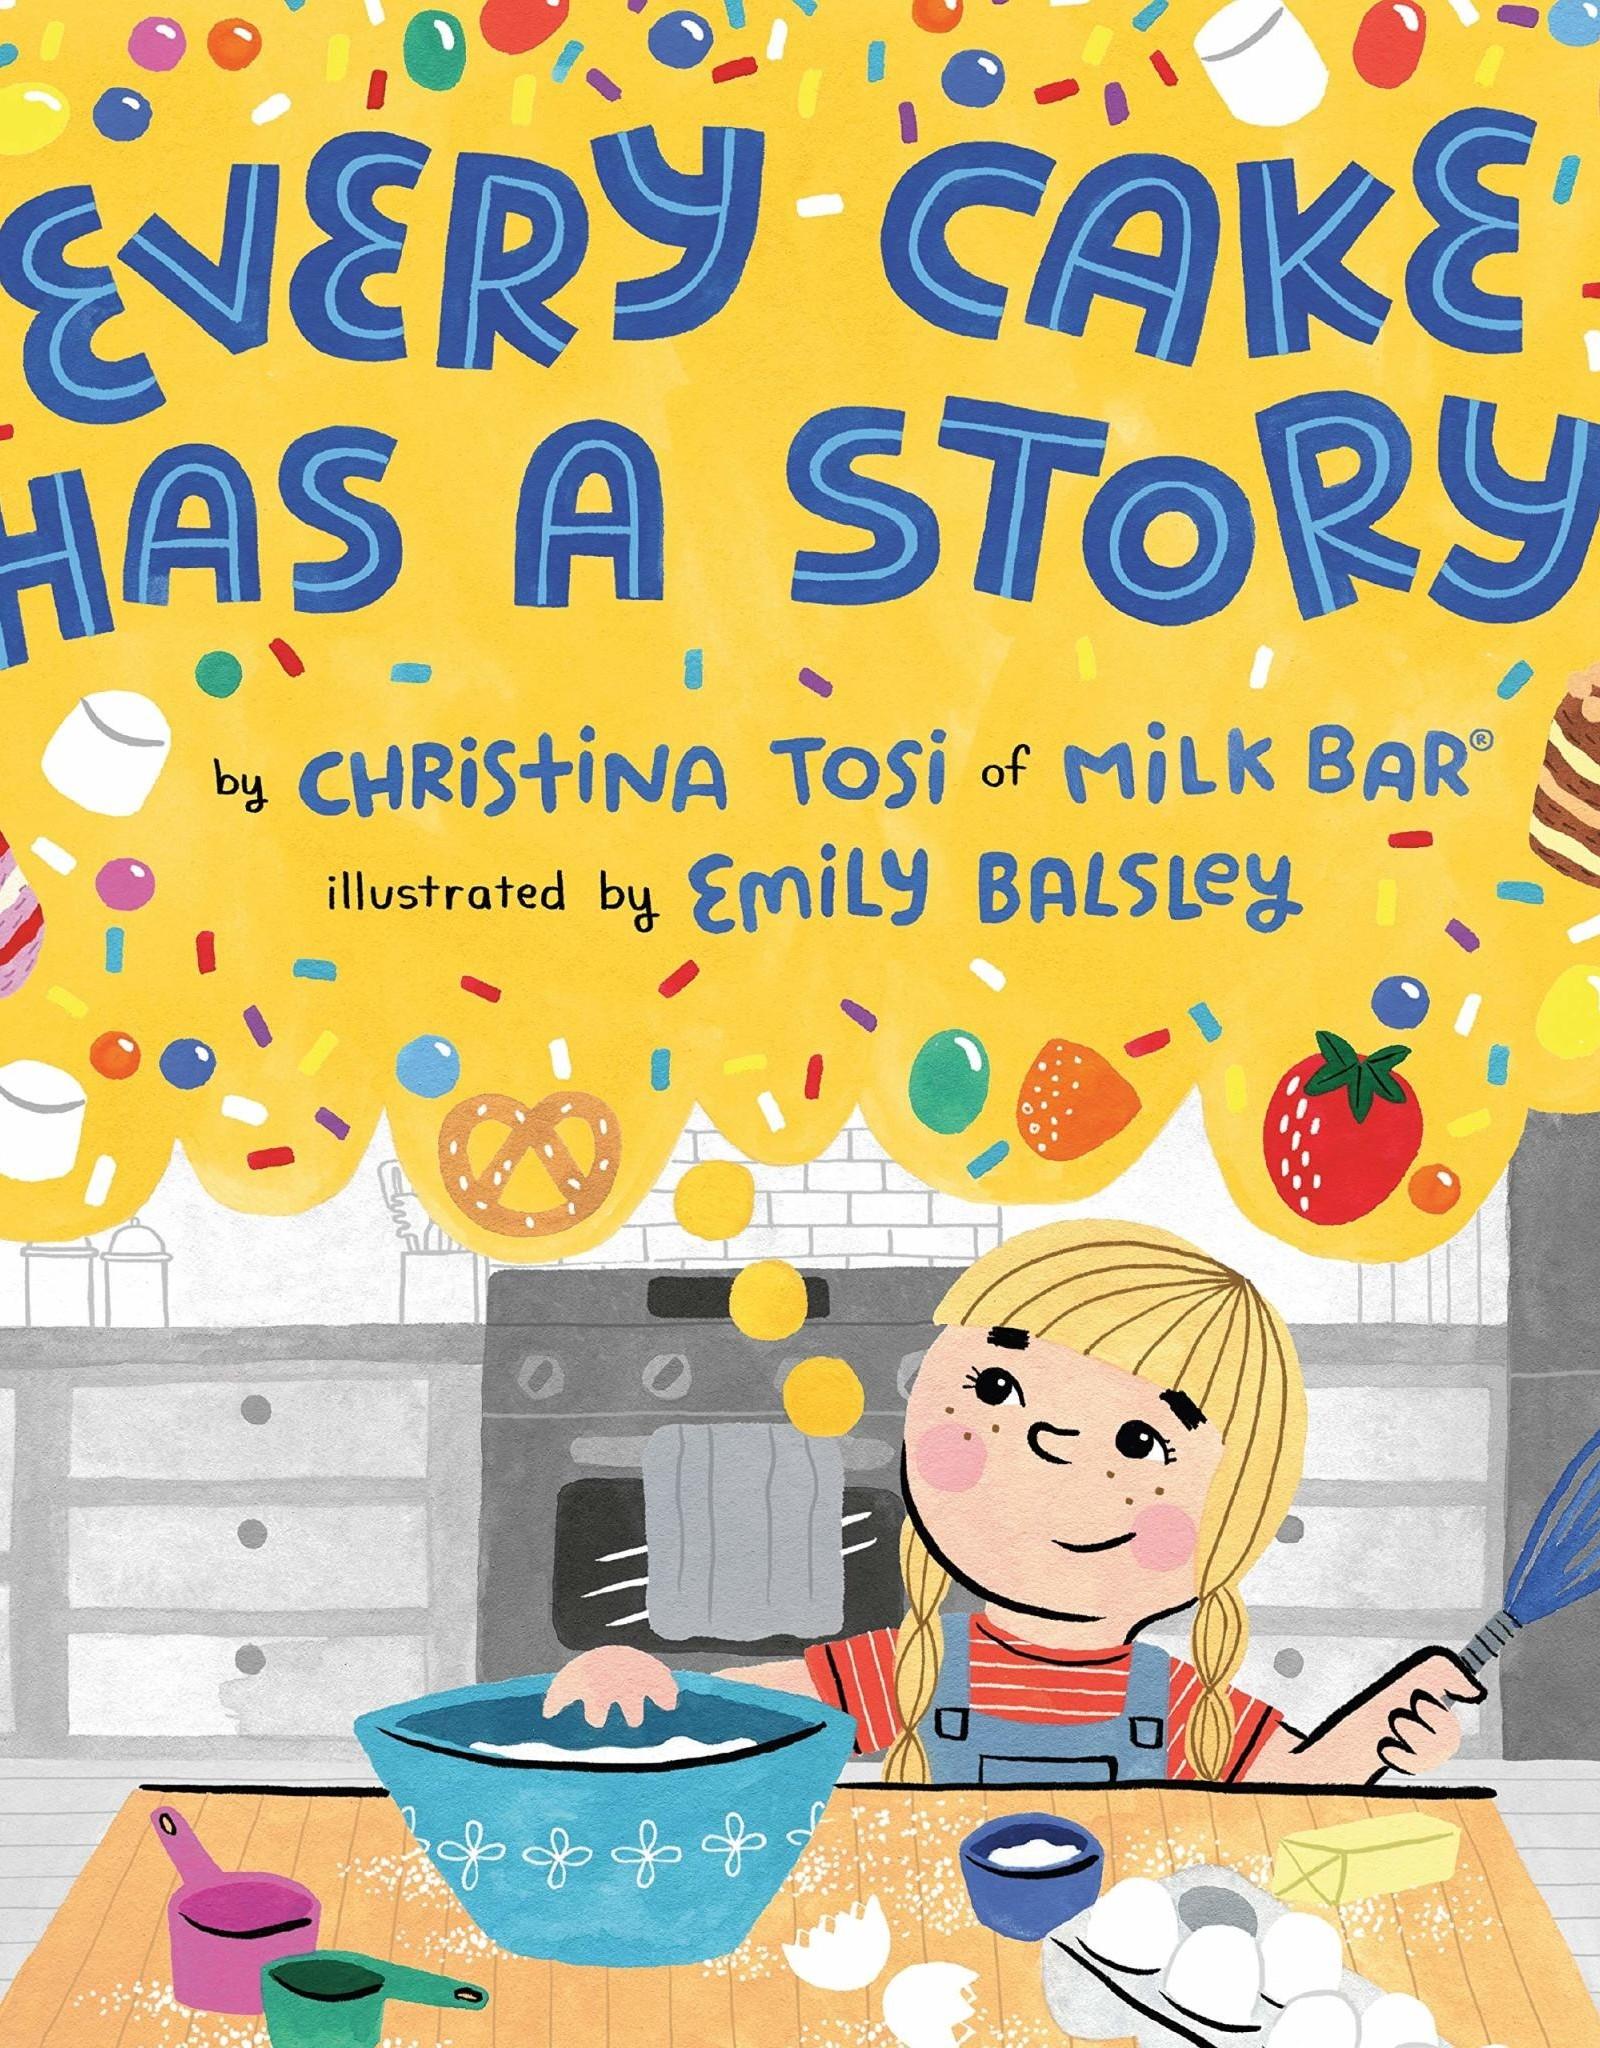 Every Cake Has a Story